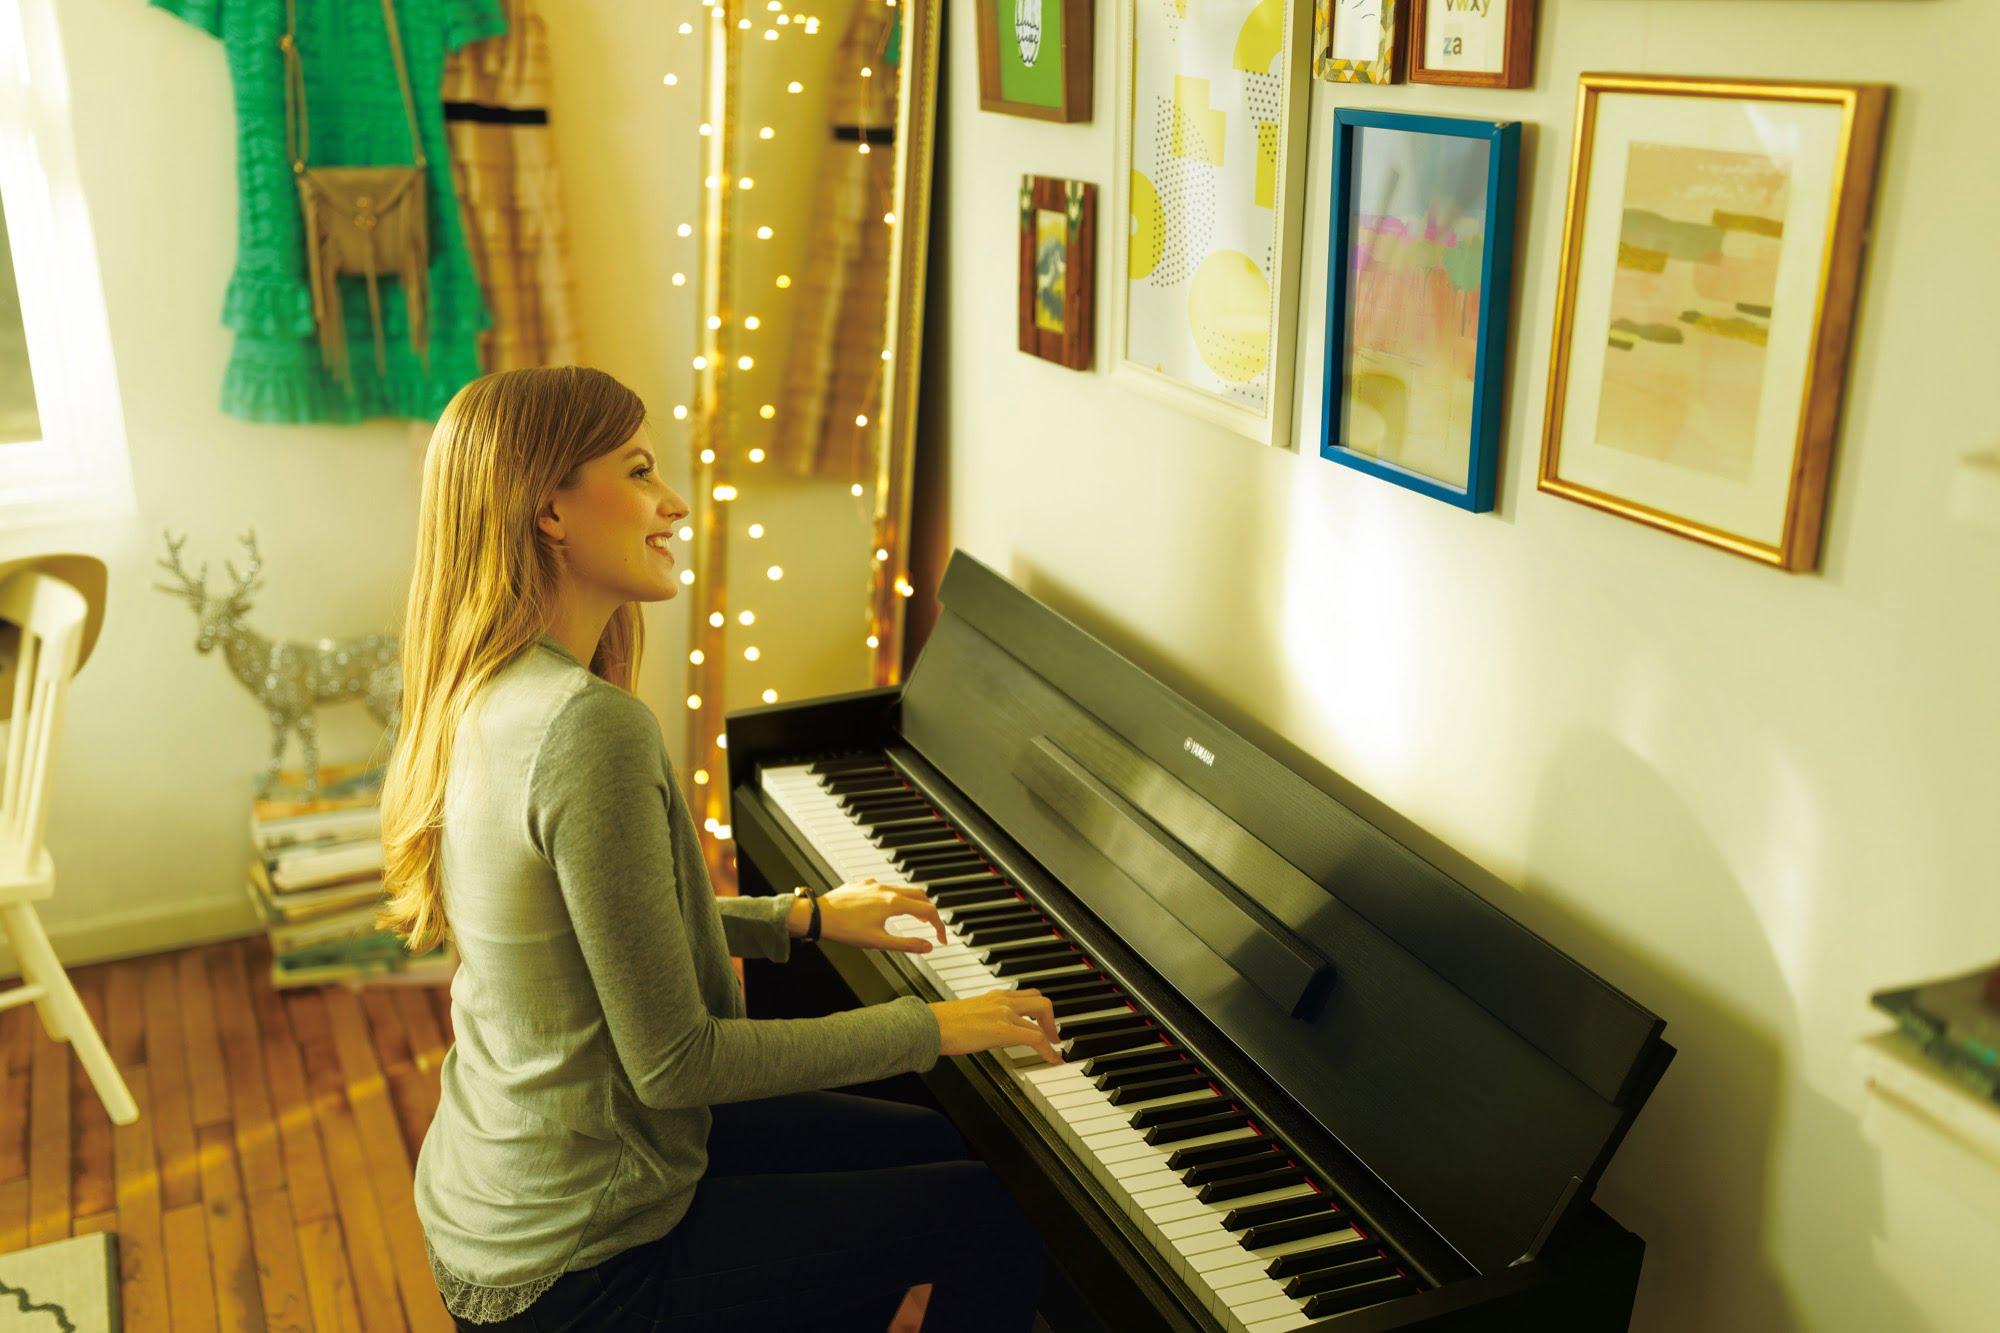 پیانویی مخصوص هنرجویان موسیقی